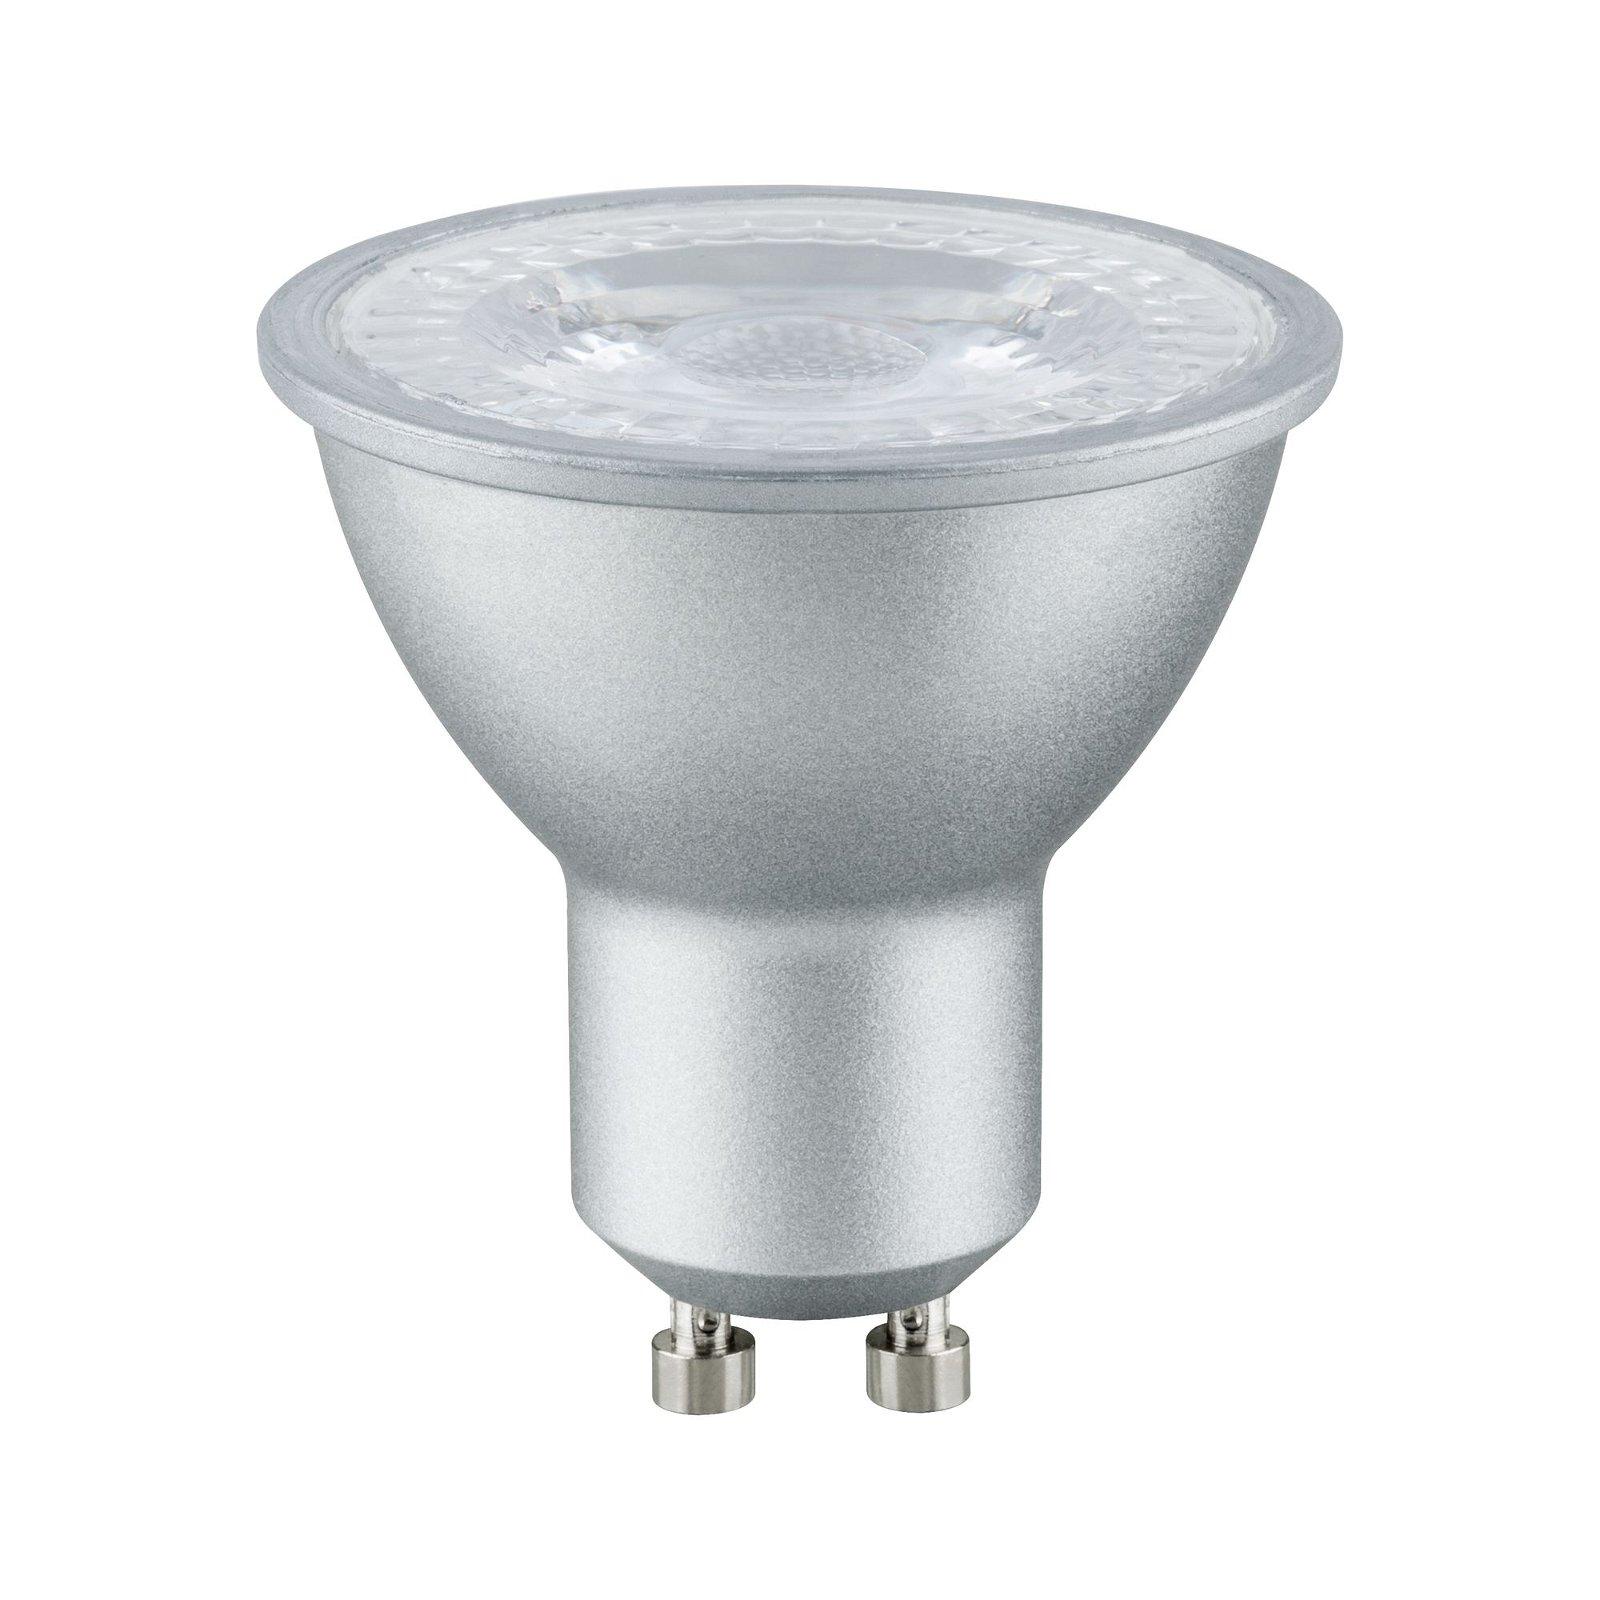 LED Reflektor GU10 230V 230lm 4W 2700K Alu